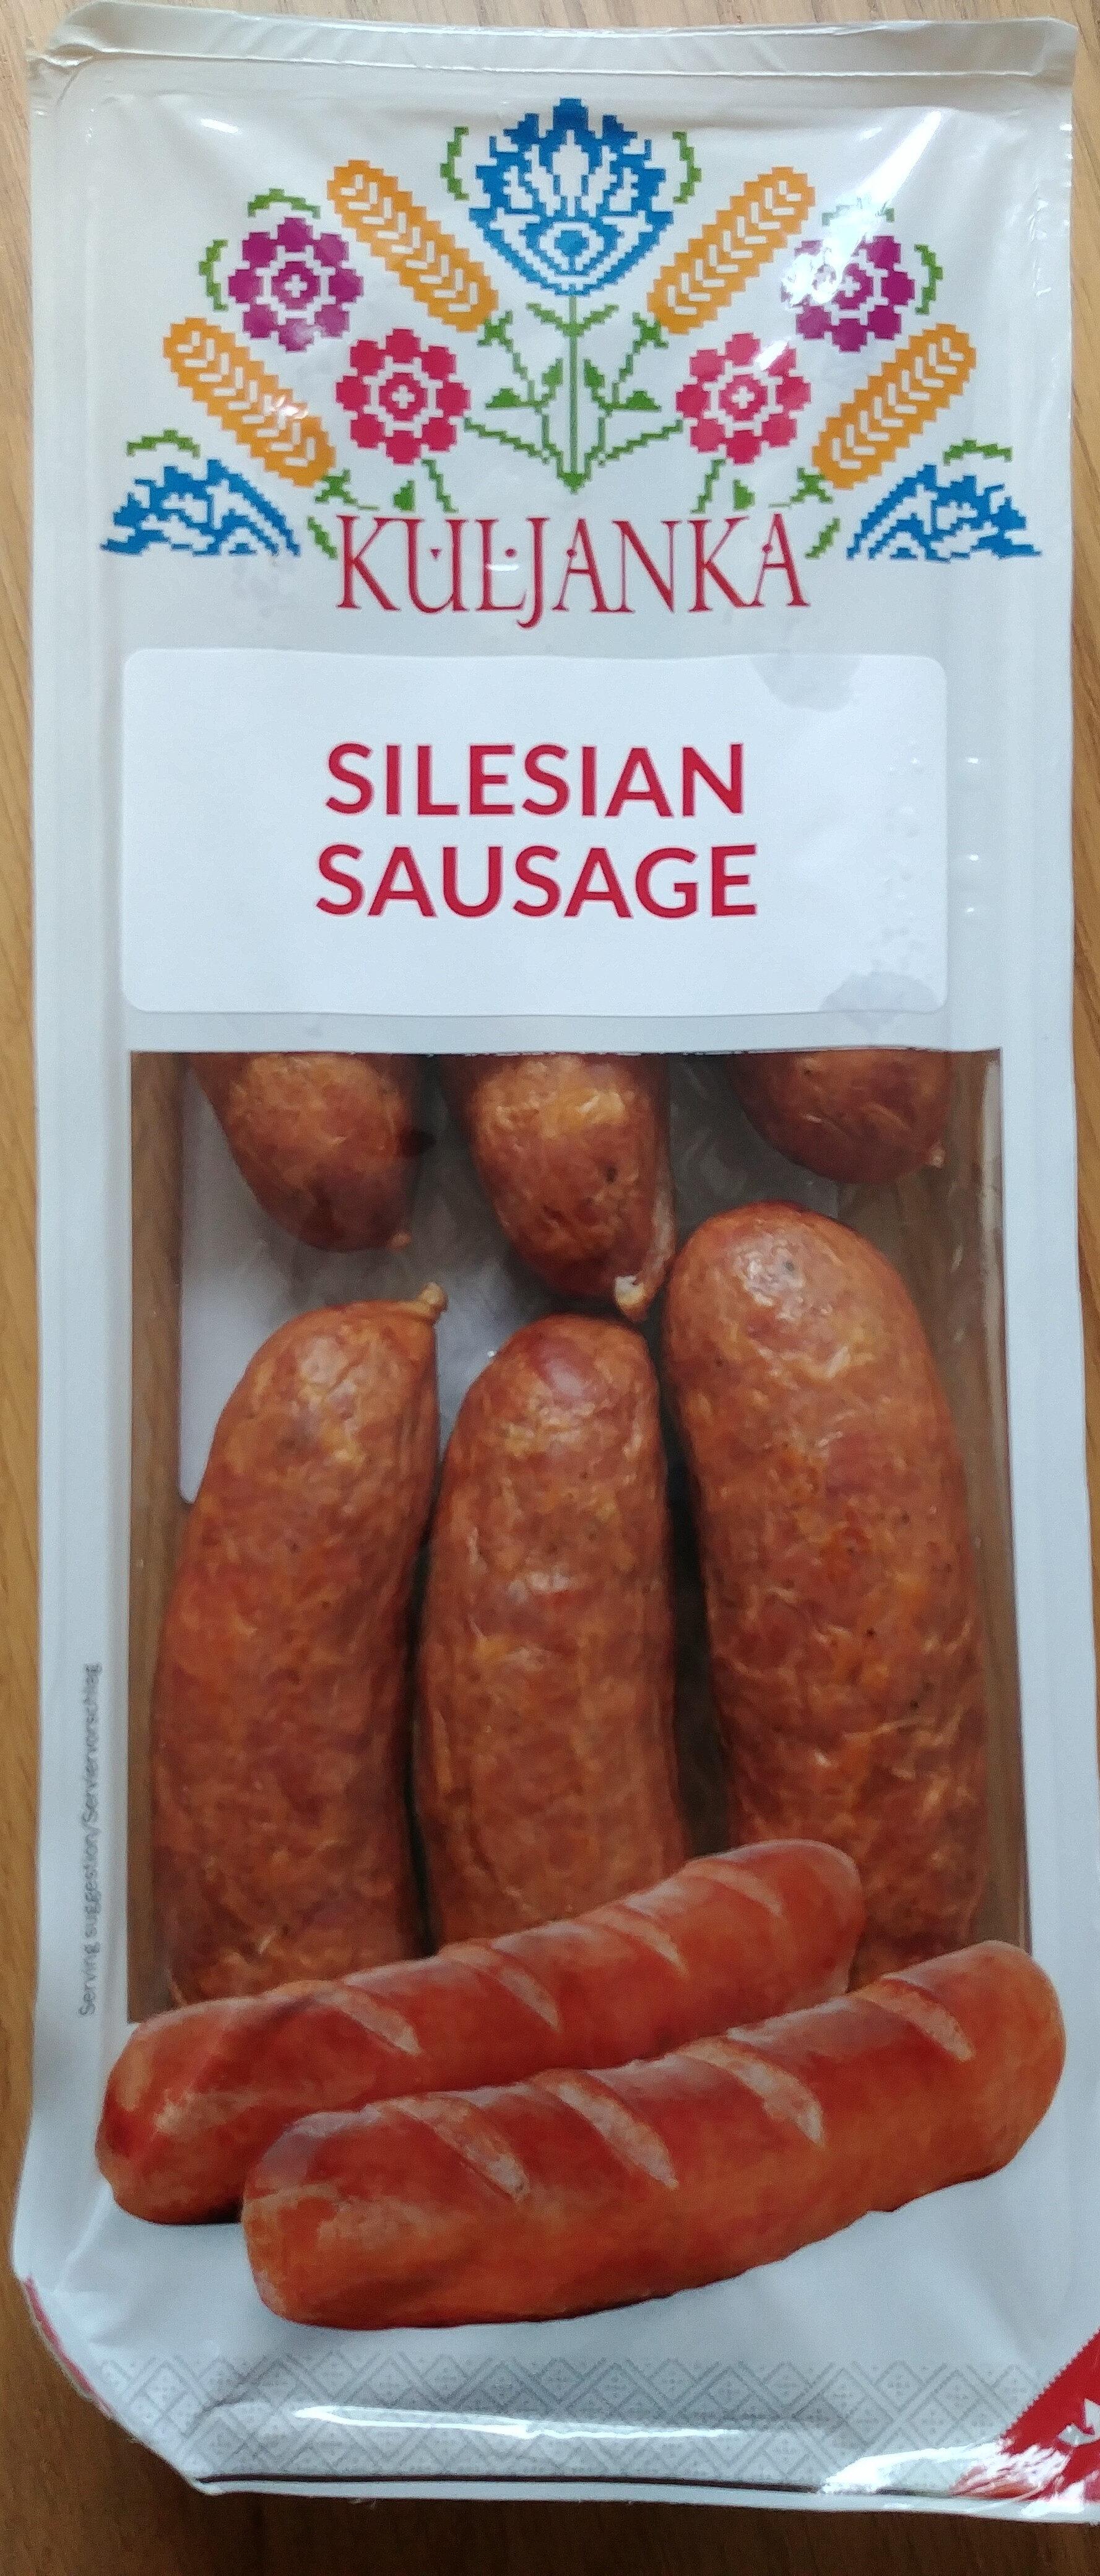 Silesian sausage - Product - en